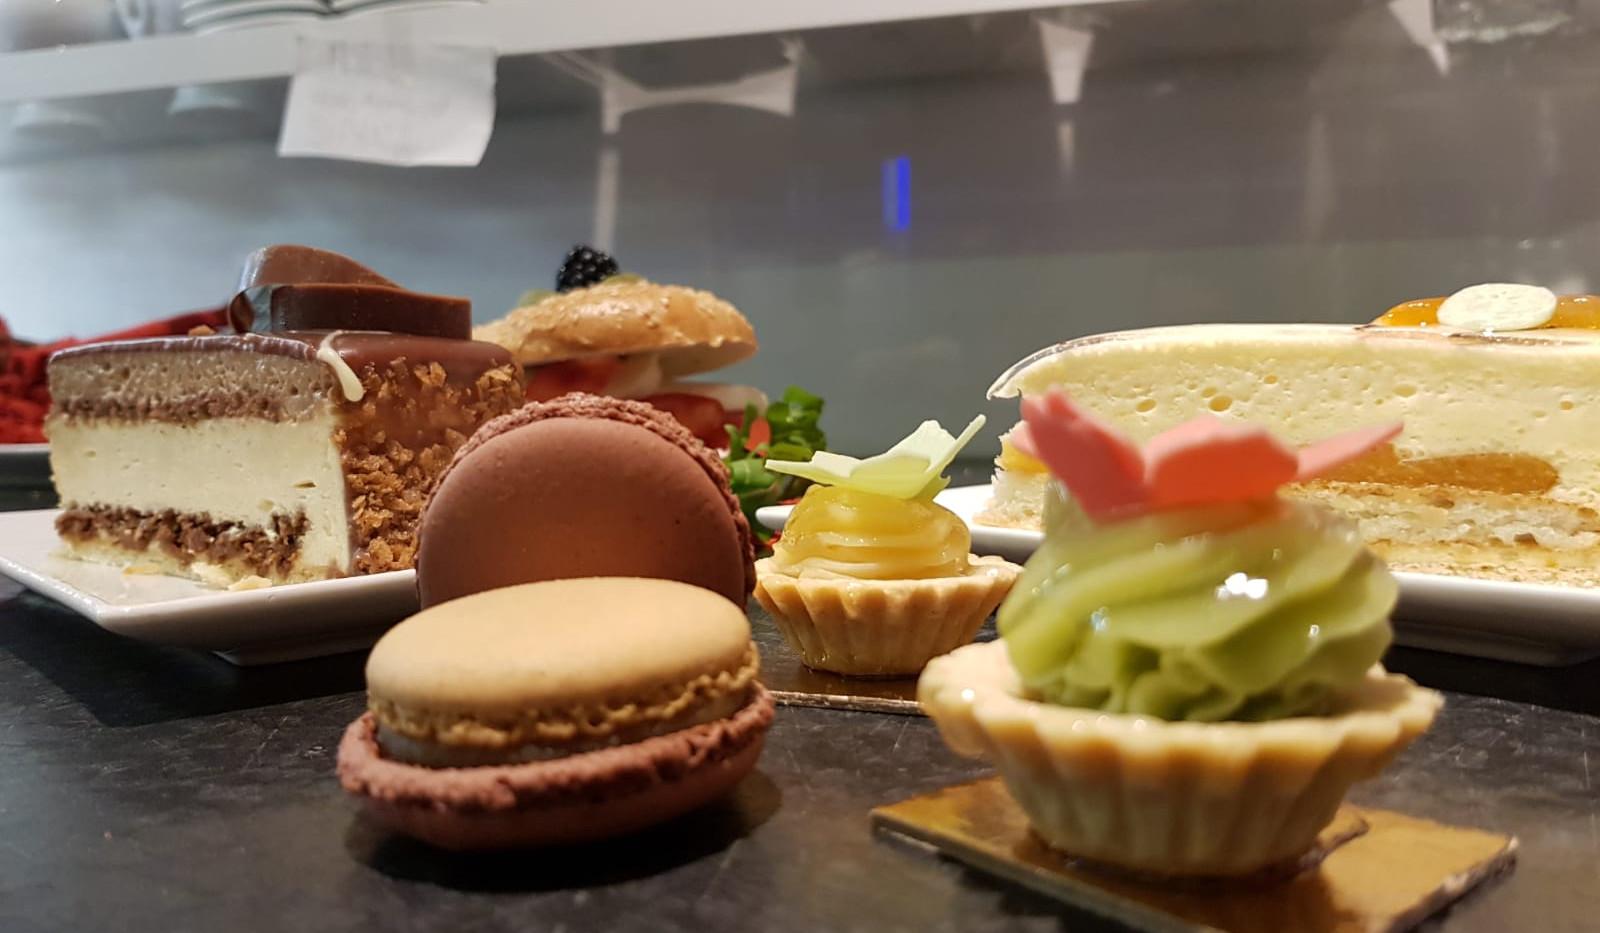 cafe-liege-aachen-am-dom-macarons-petit-four-süß.jpg